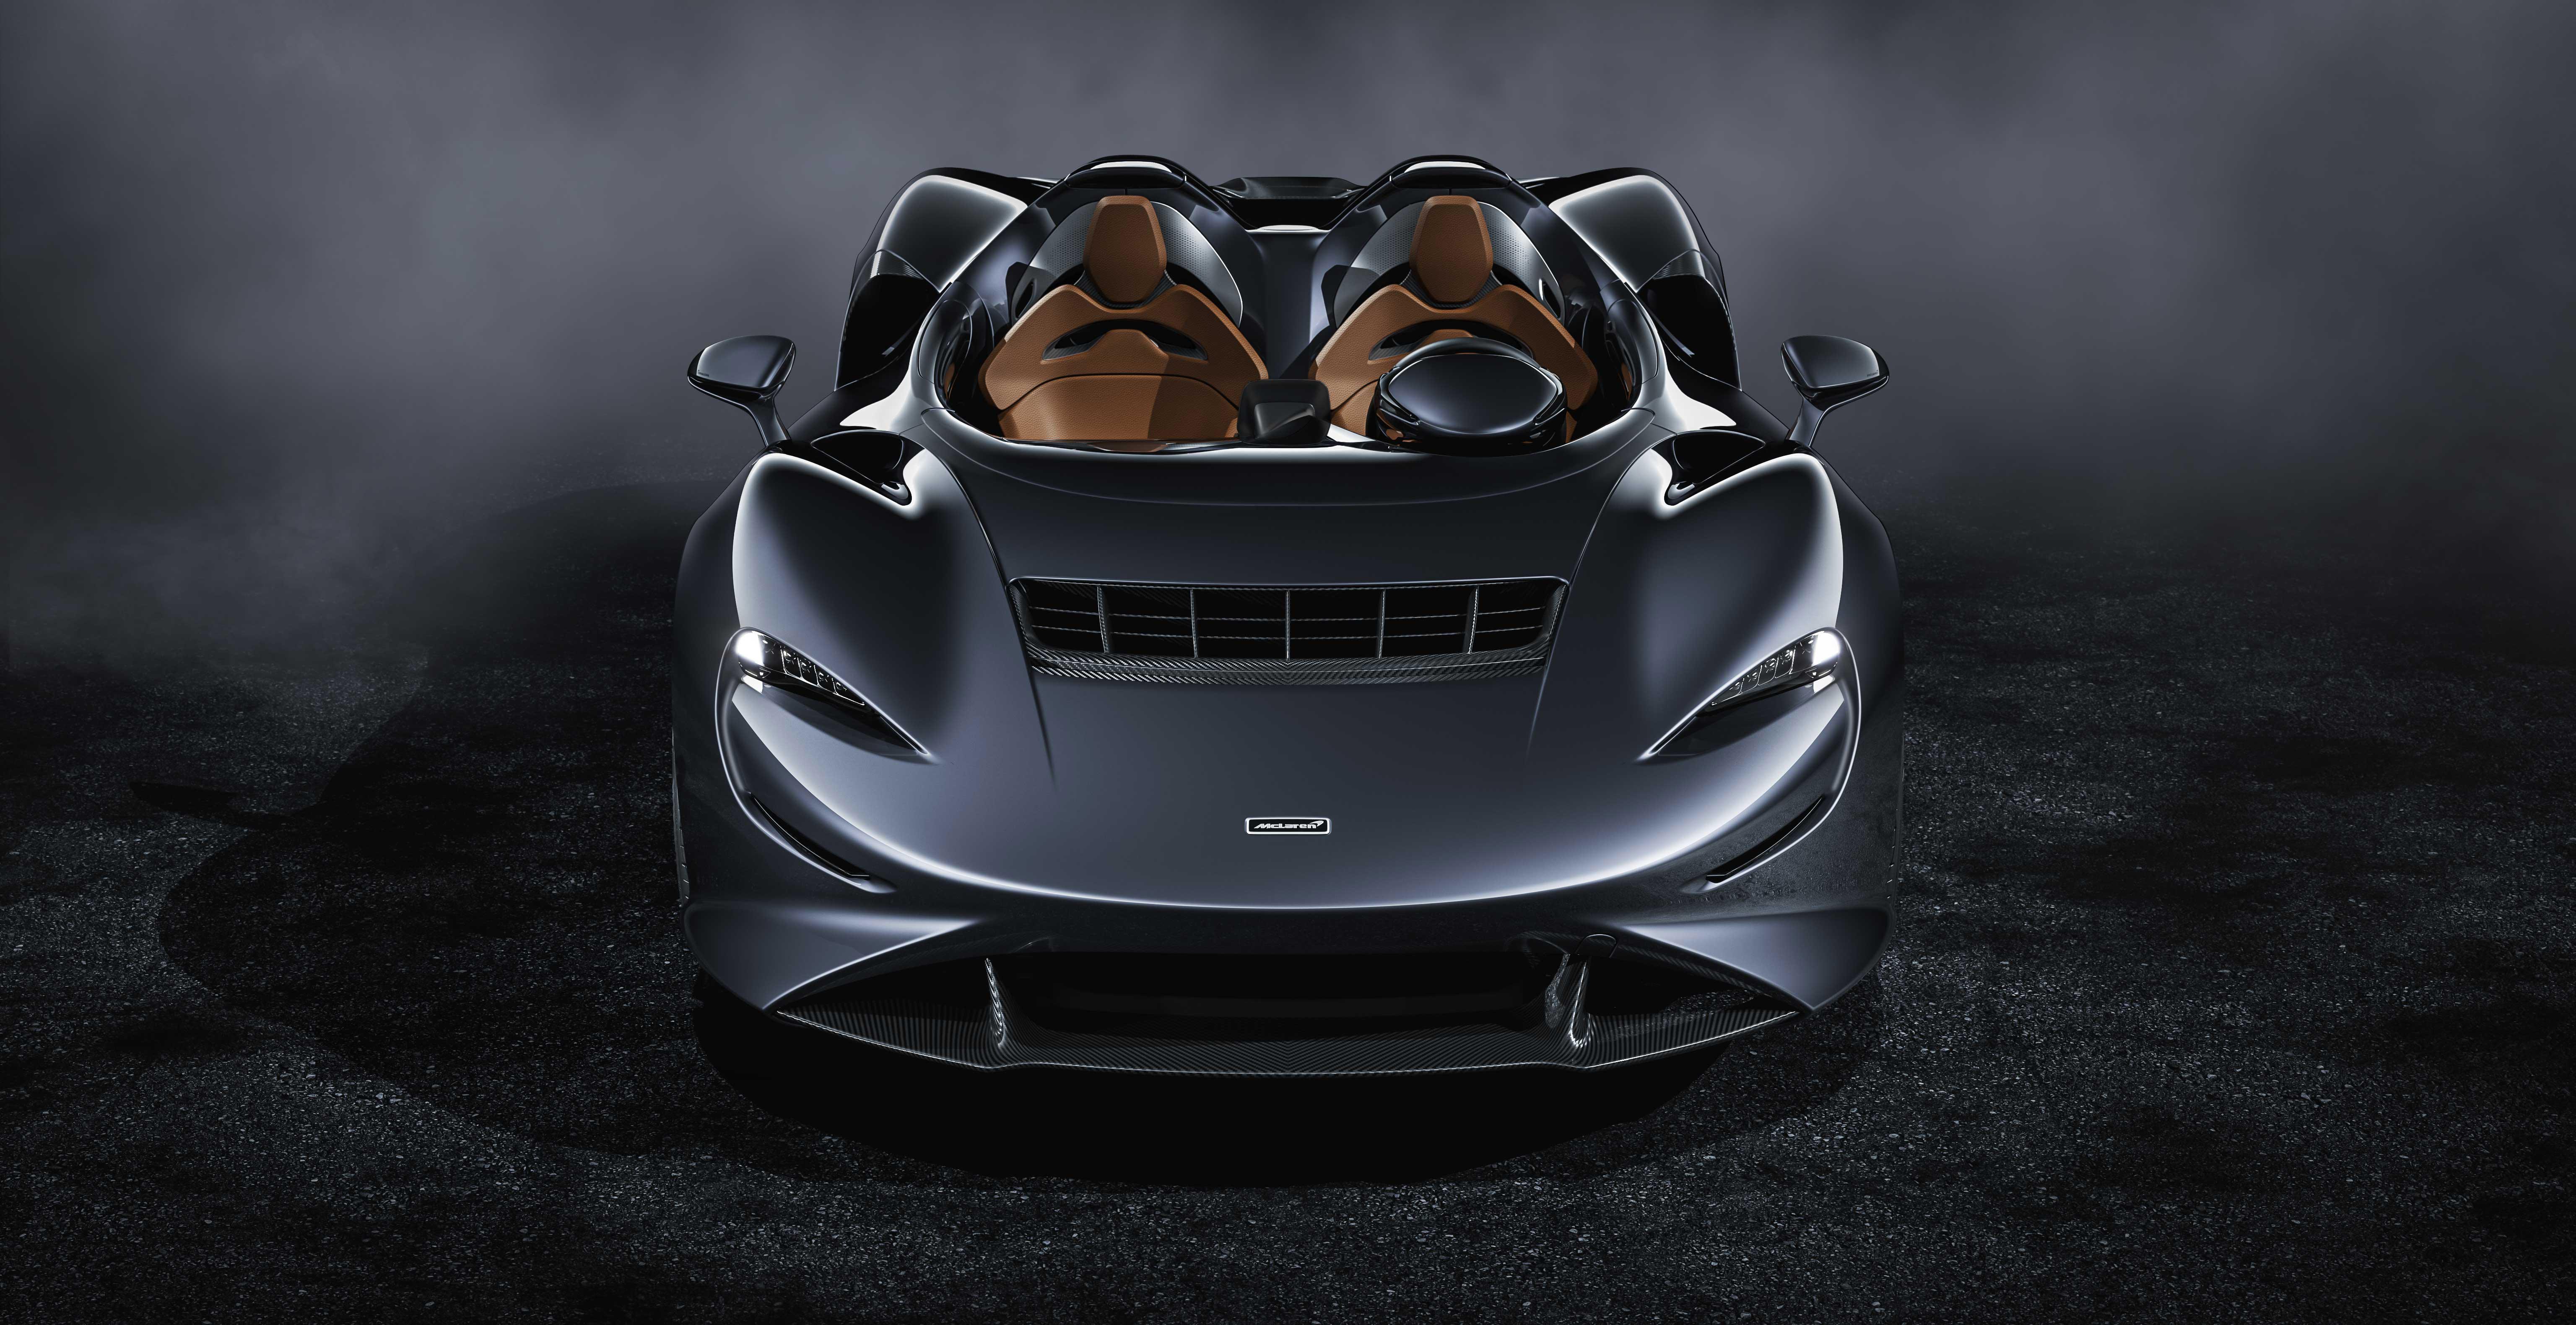 mclaren elva 2020 1577652719 - McLaren Elva 2020 - McLaren Elva 2020 4k wallpaper